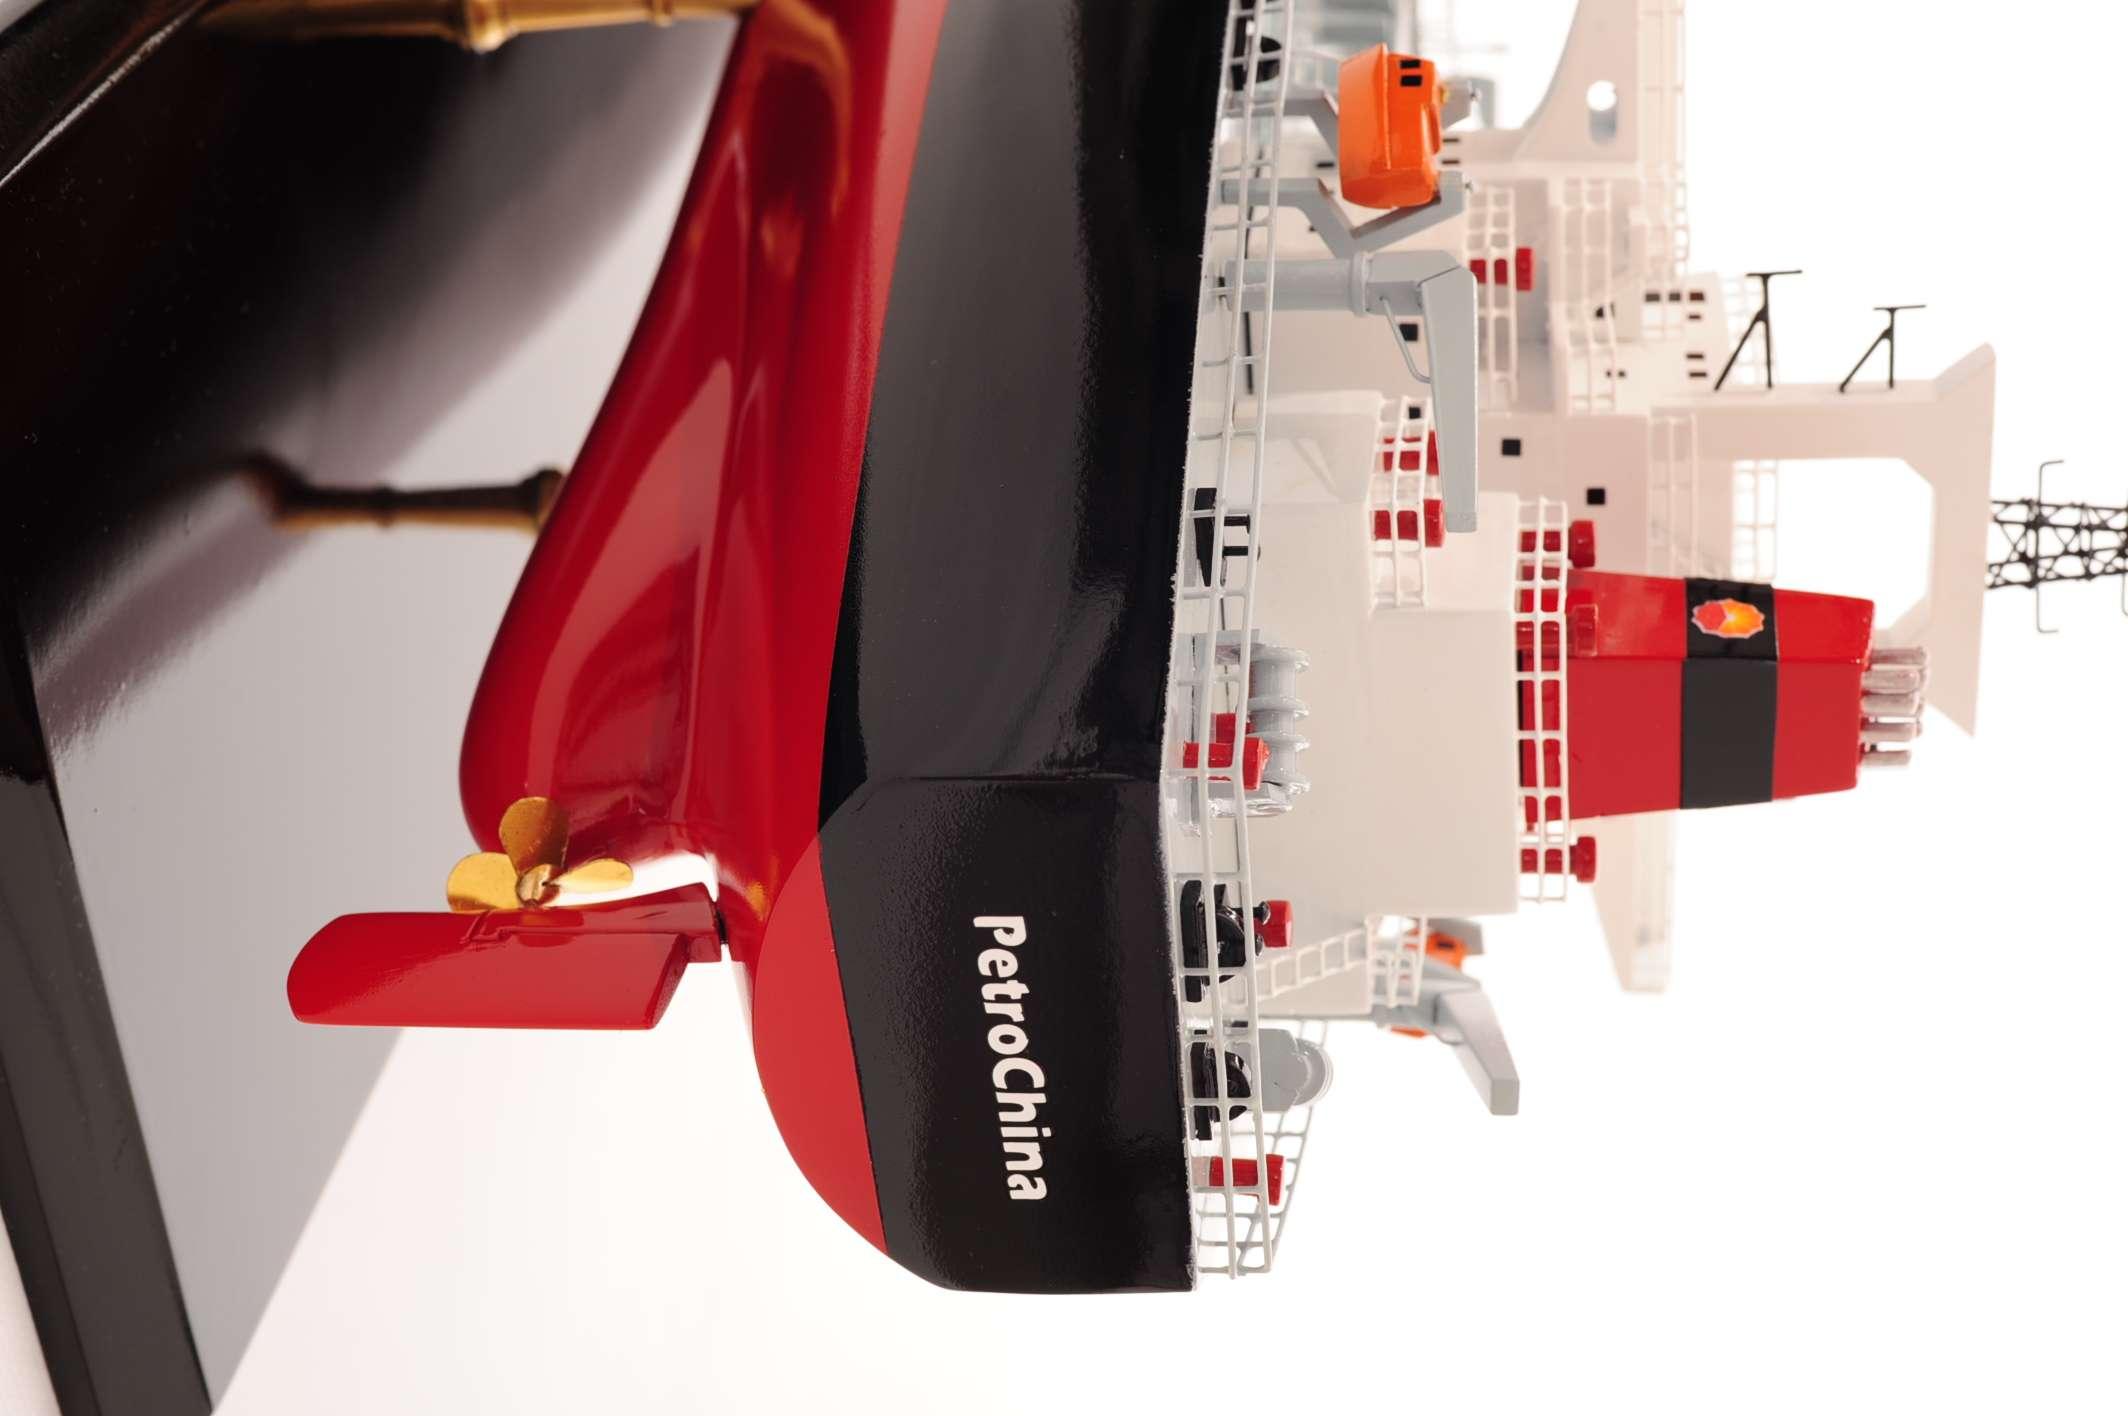 1475-4411-Very-Large-Crude-Oil-VLCC-Tanker